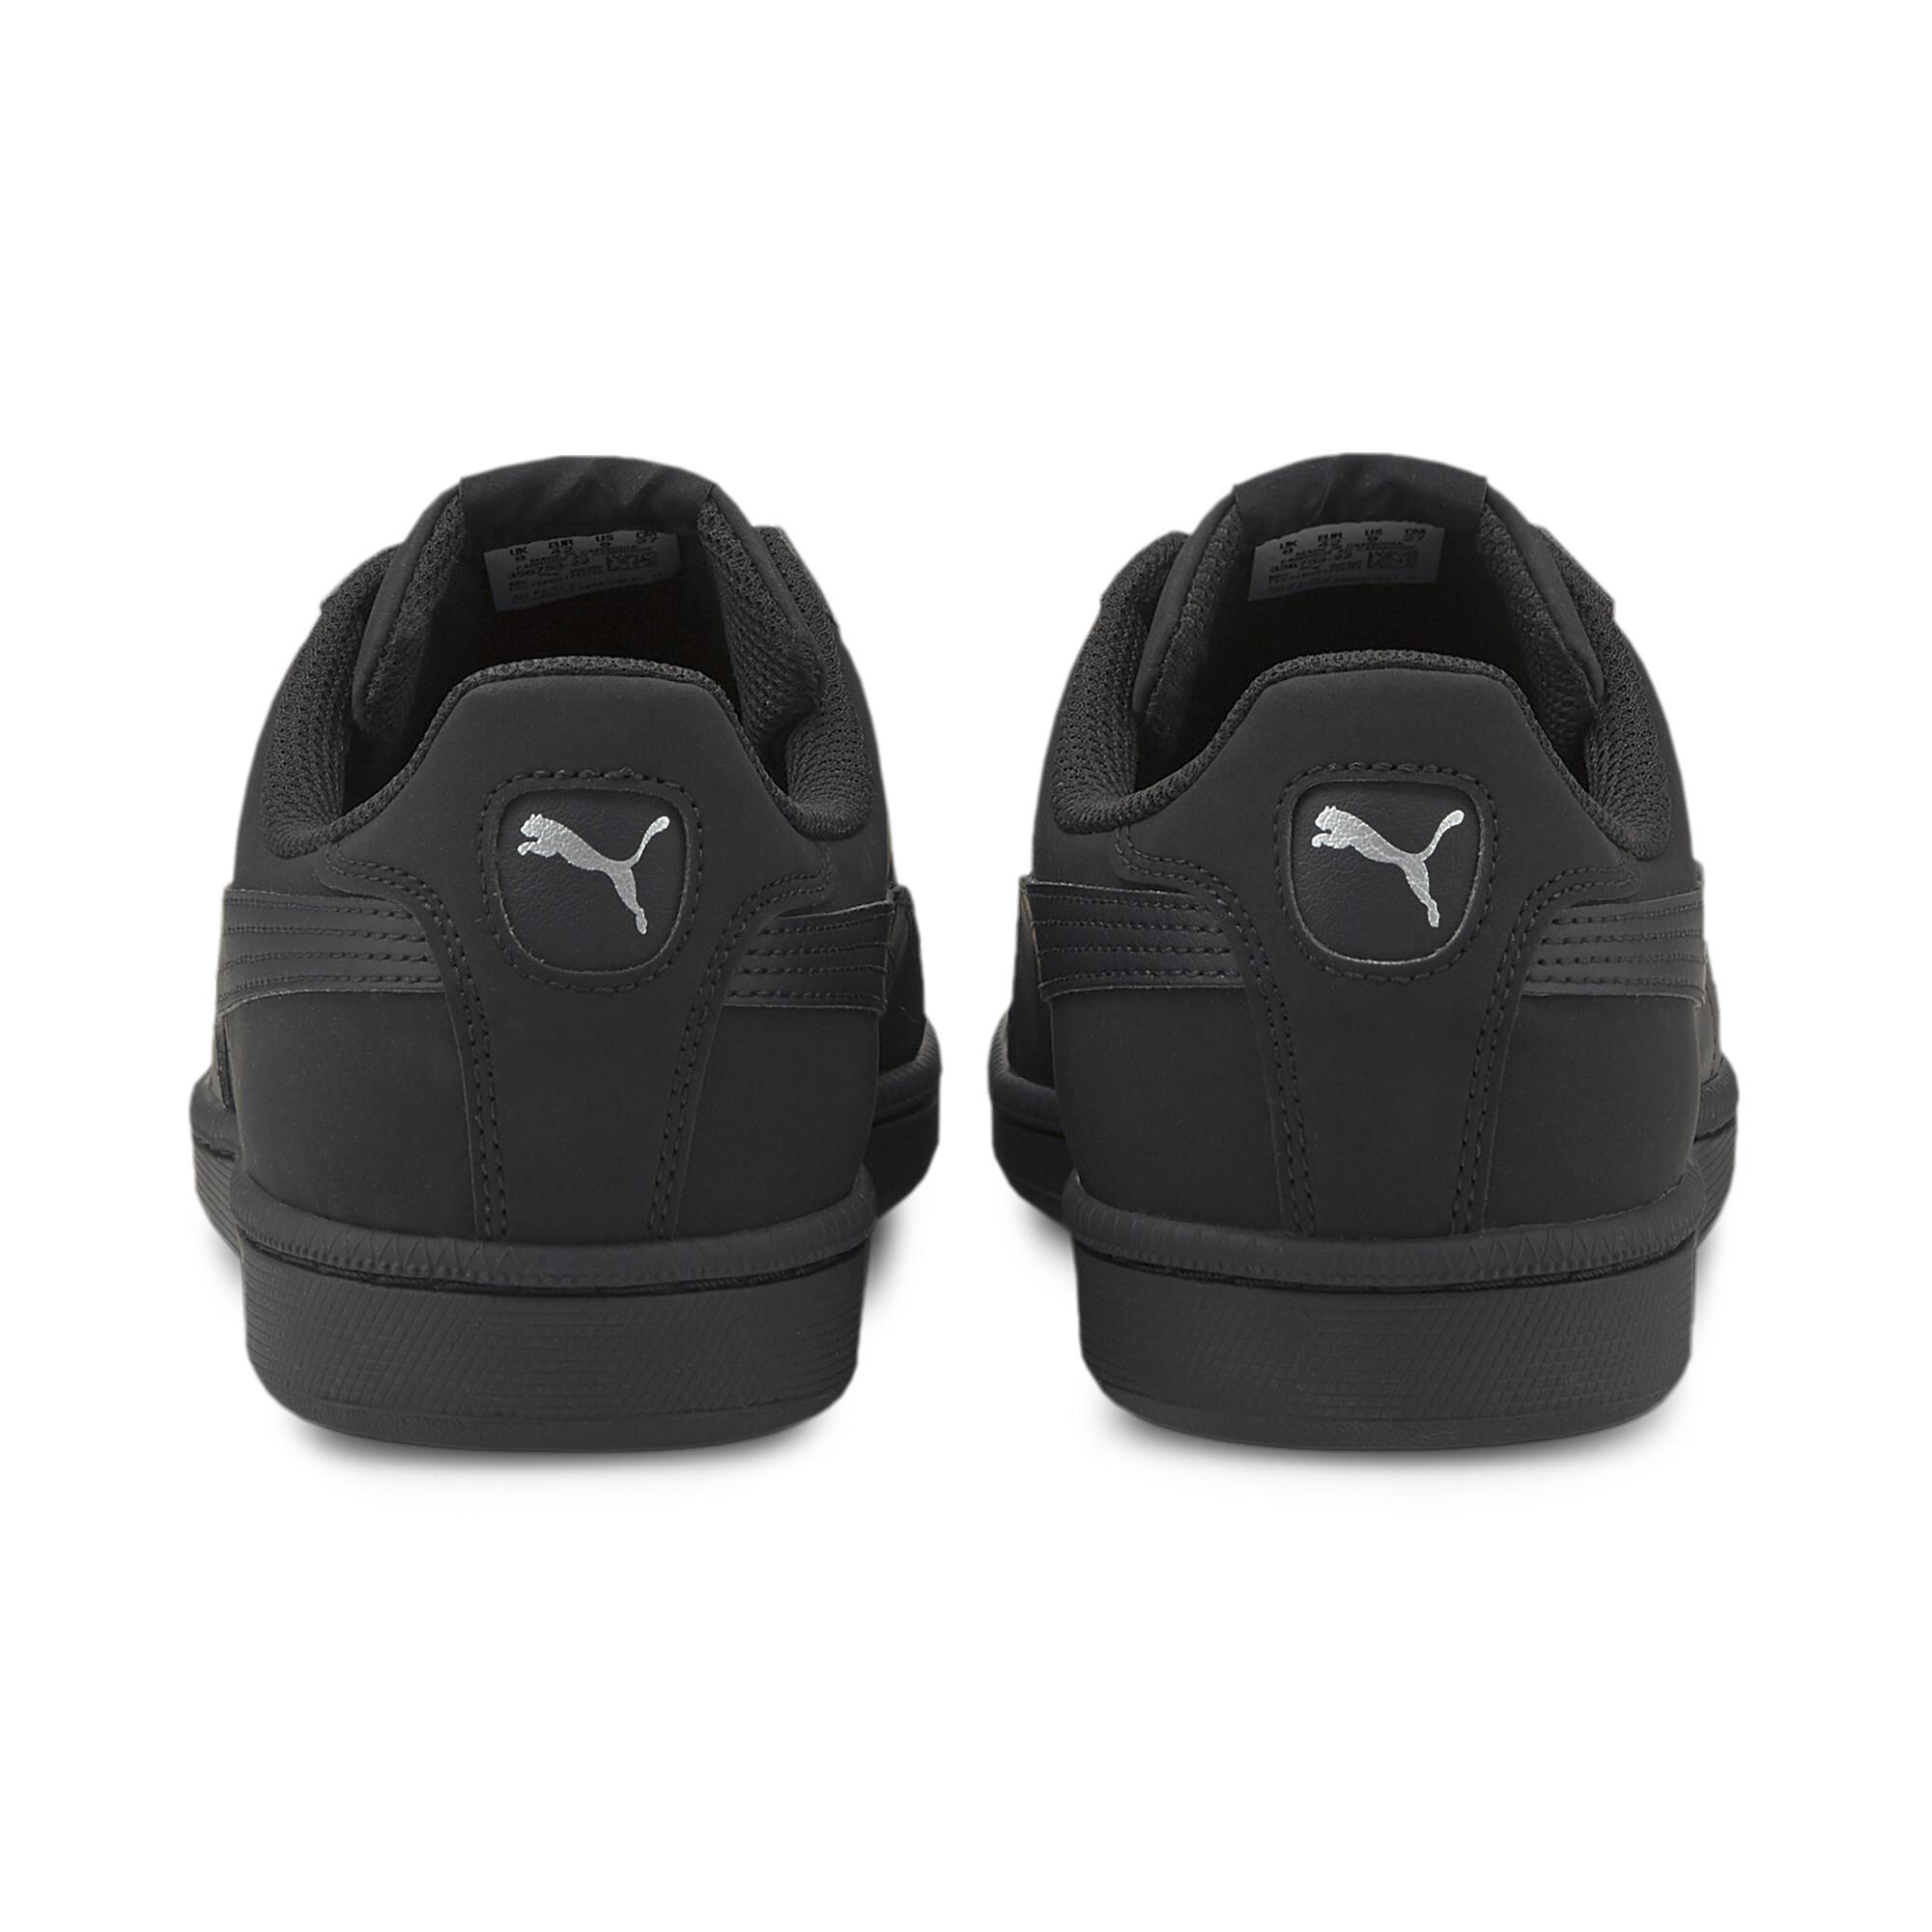 Indexbild 8 - PUMA Smash Buck Sneaker Unisex Schuhe Sport Classics Neu